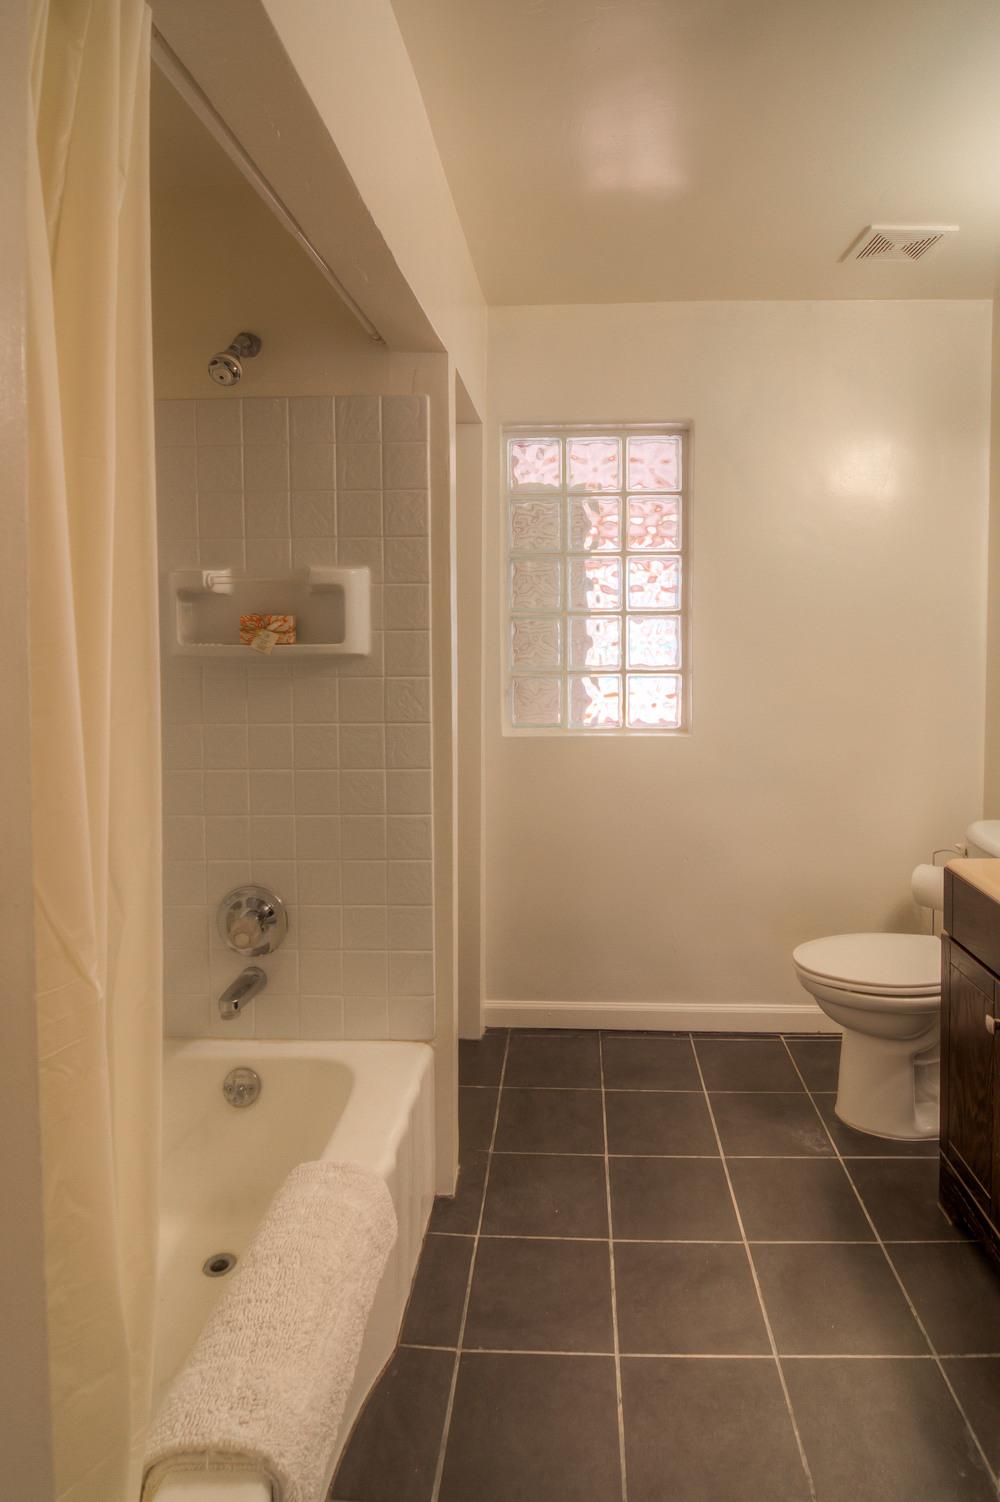 22 Bathroom 1 photo a.jpg